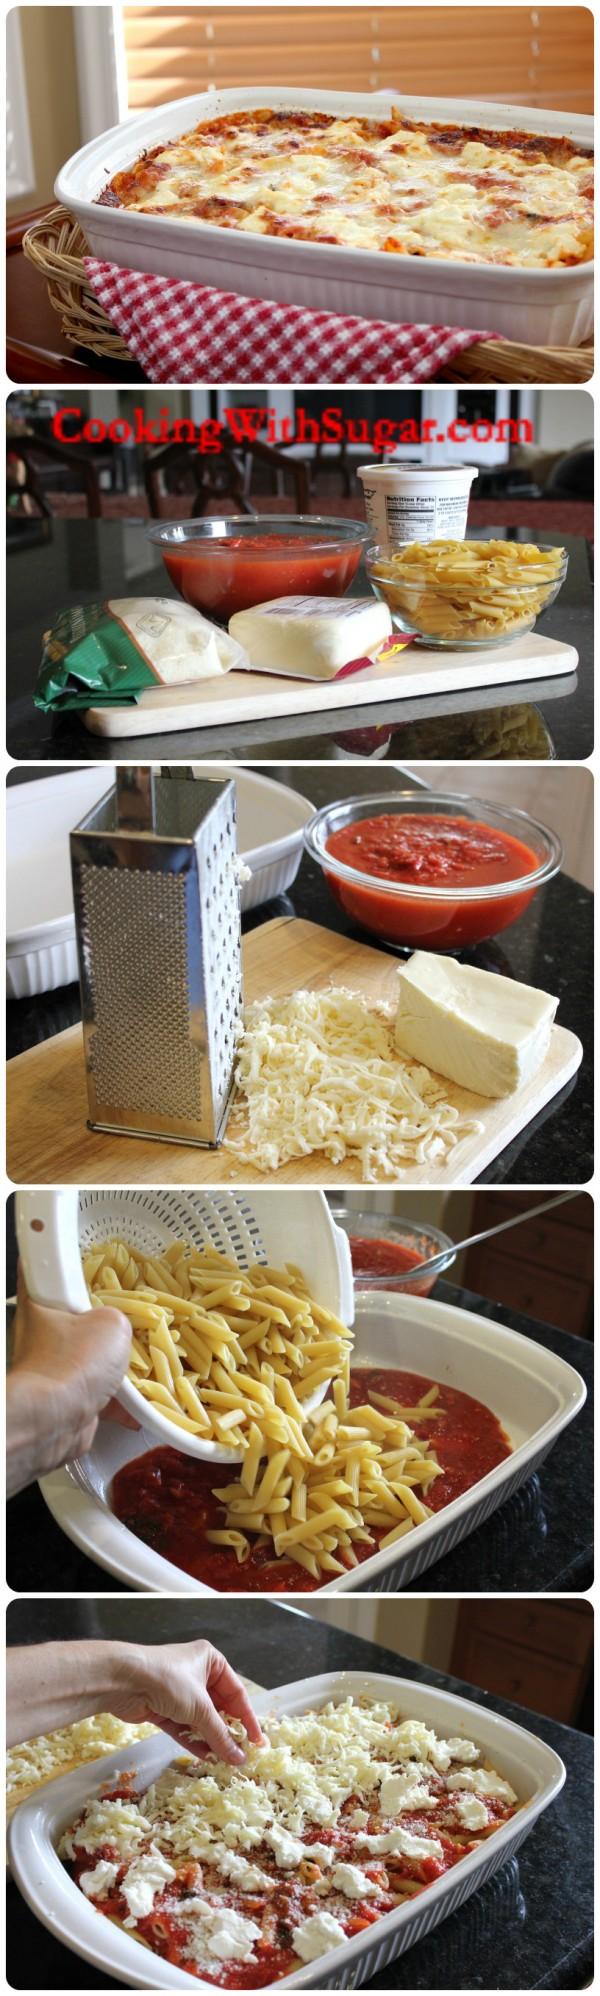 italian-recipes-baked-ziti-macaroni-casserole-0